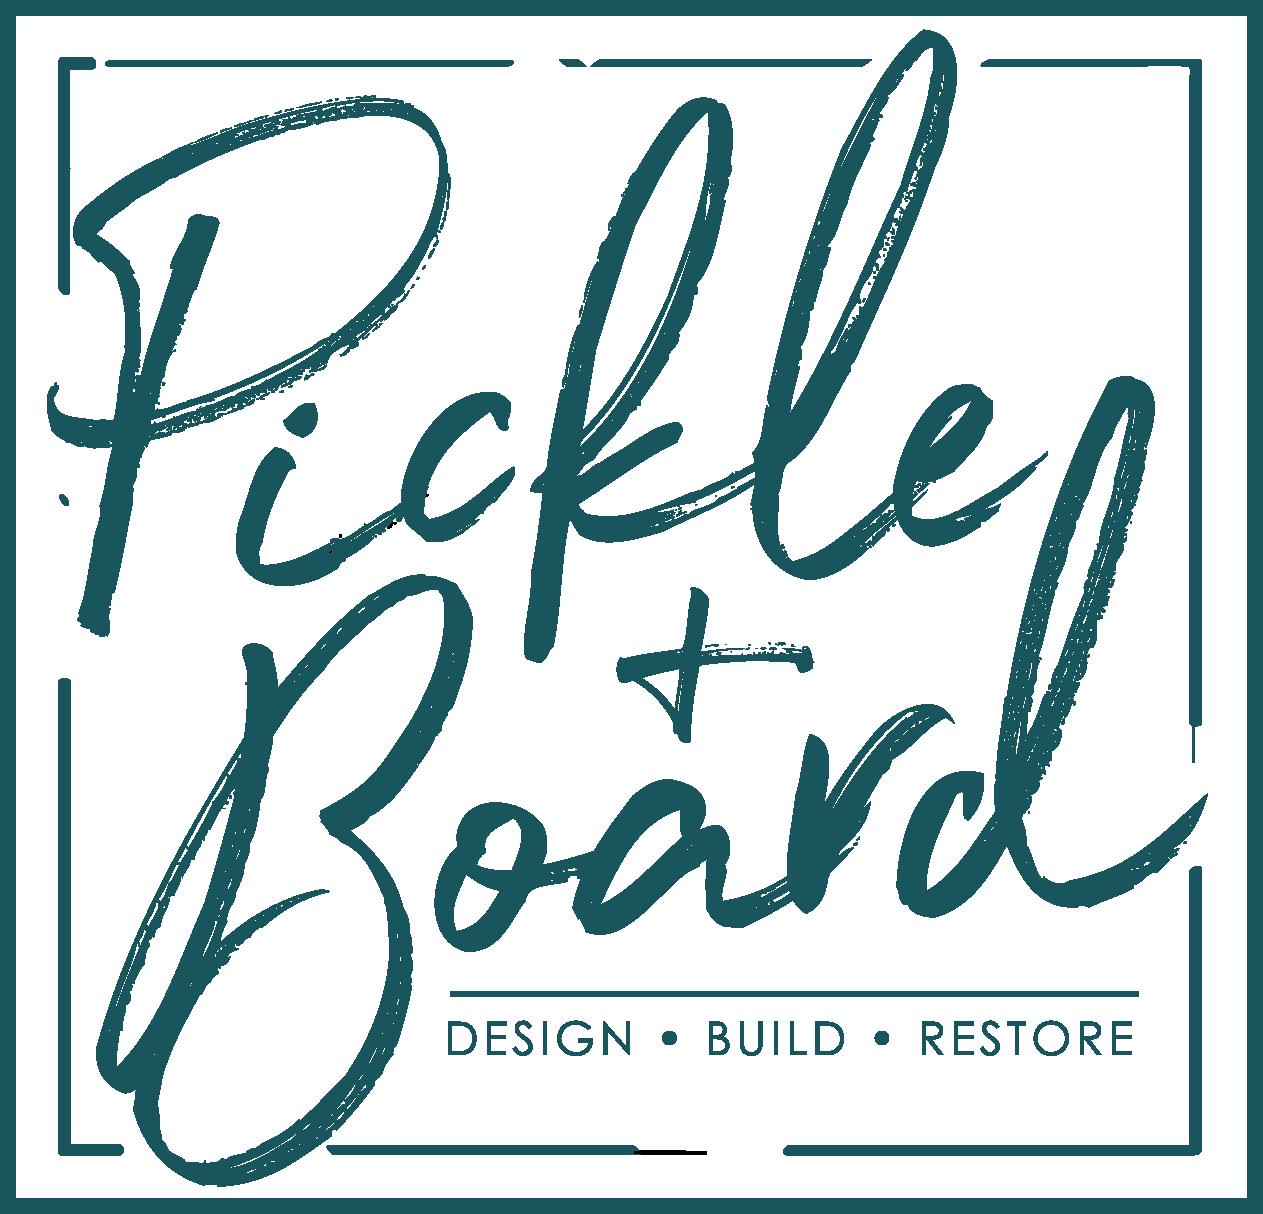 Pickle & Board